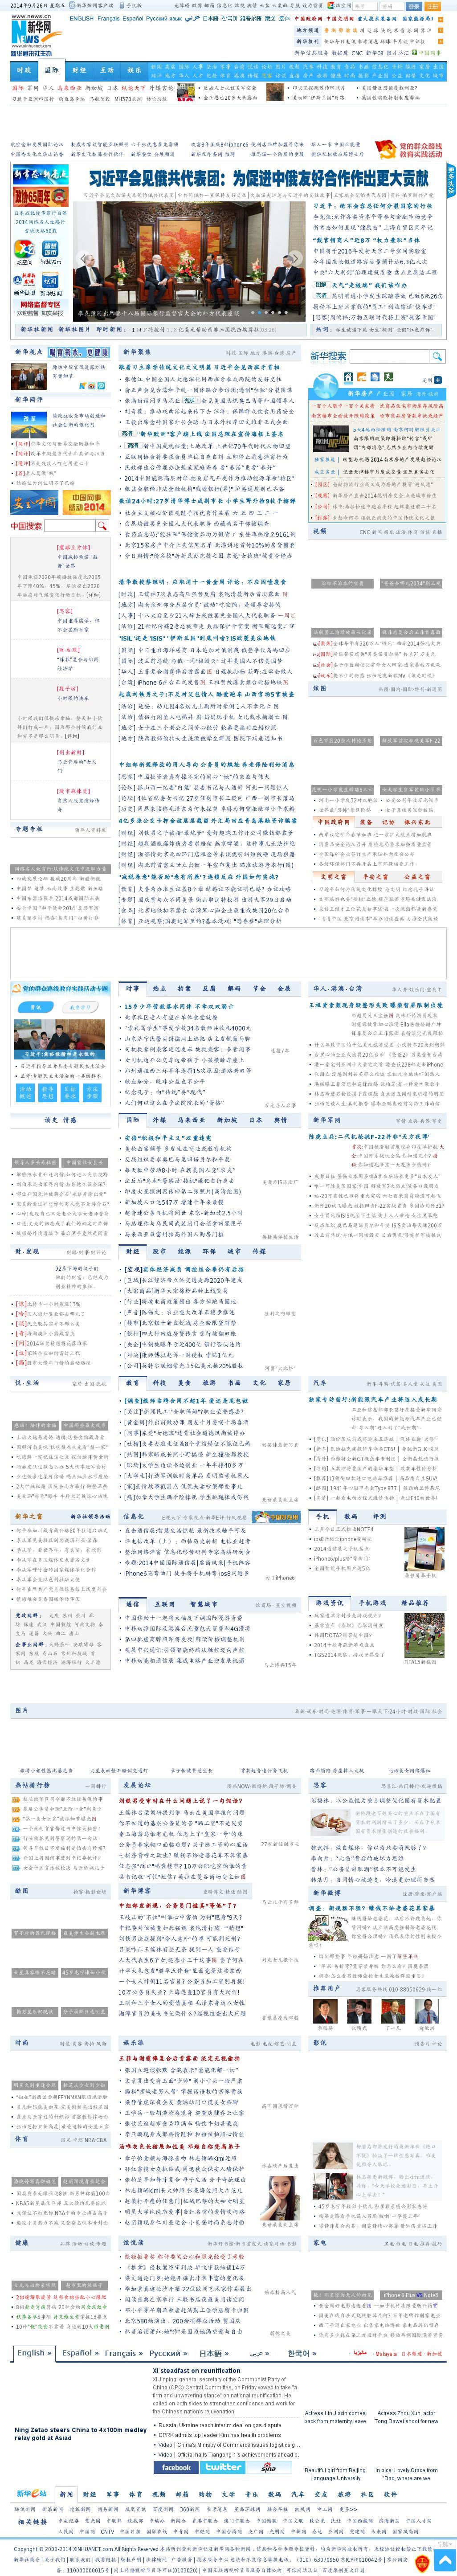 Xinhua at Friday Sept. 26, 2014, 8:18 p.m. UTC